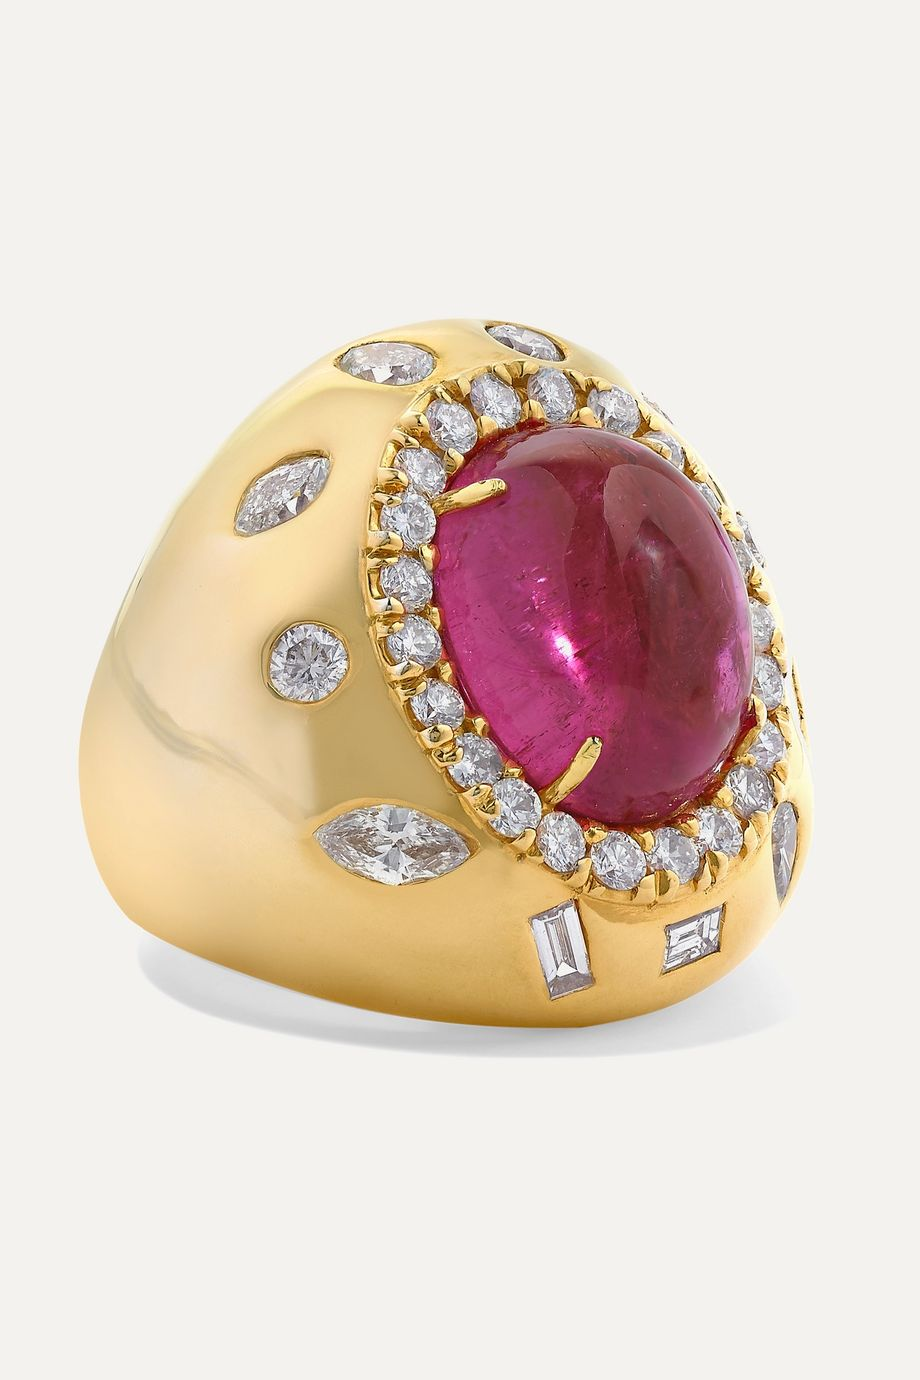 Kimberly McDonald 18-karat green gold, rubellite and diamond ring